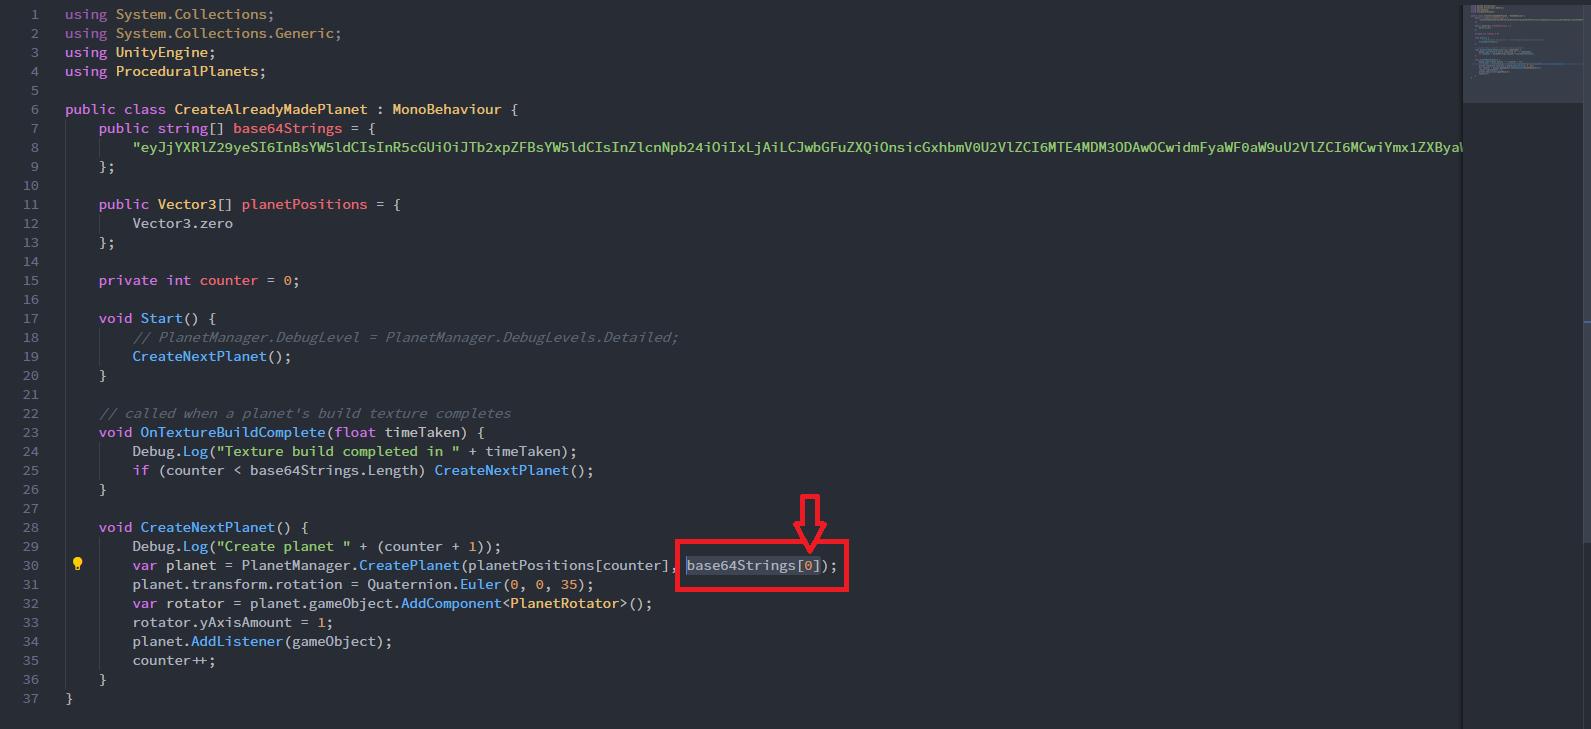 ErrScreenshotCode.png